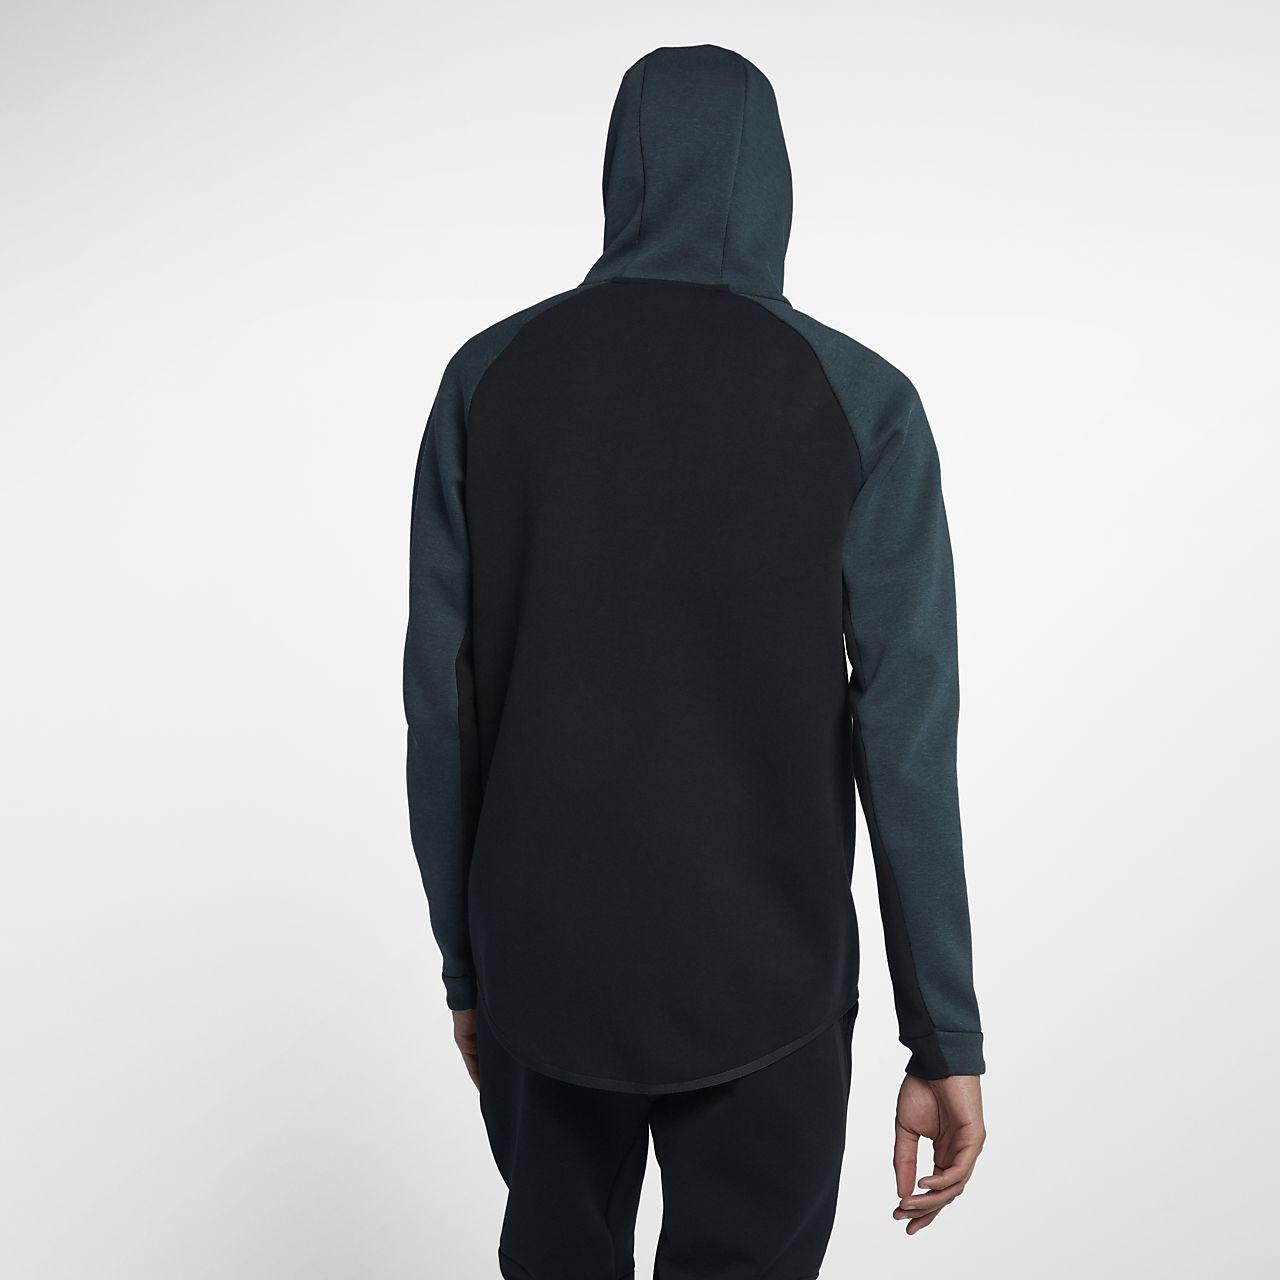 Buy Black Nike Tech Fleece Hoodie Up To 46 Discounts